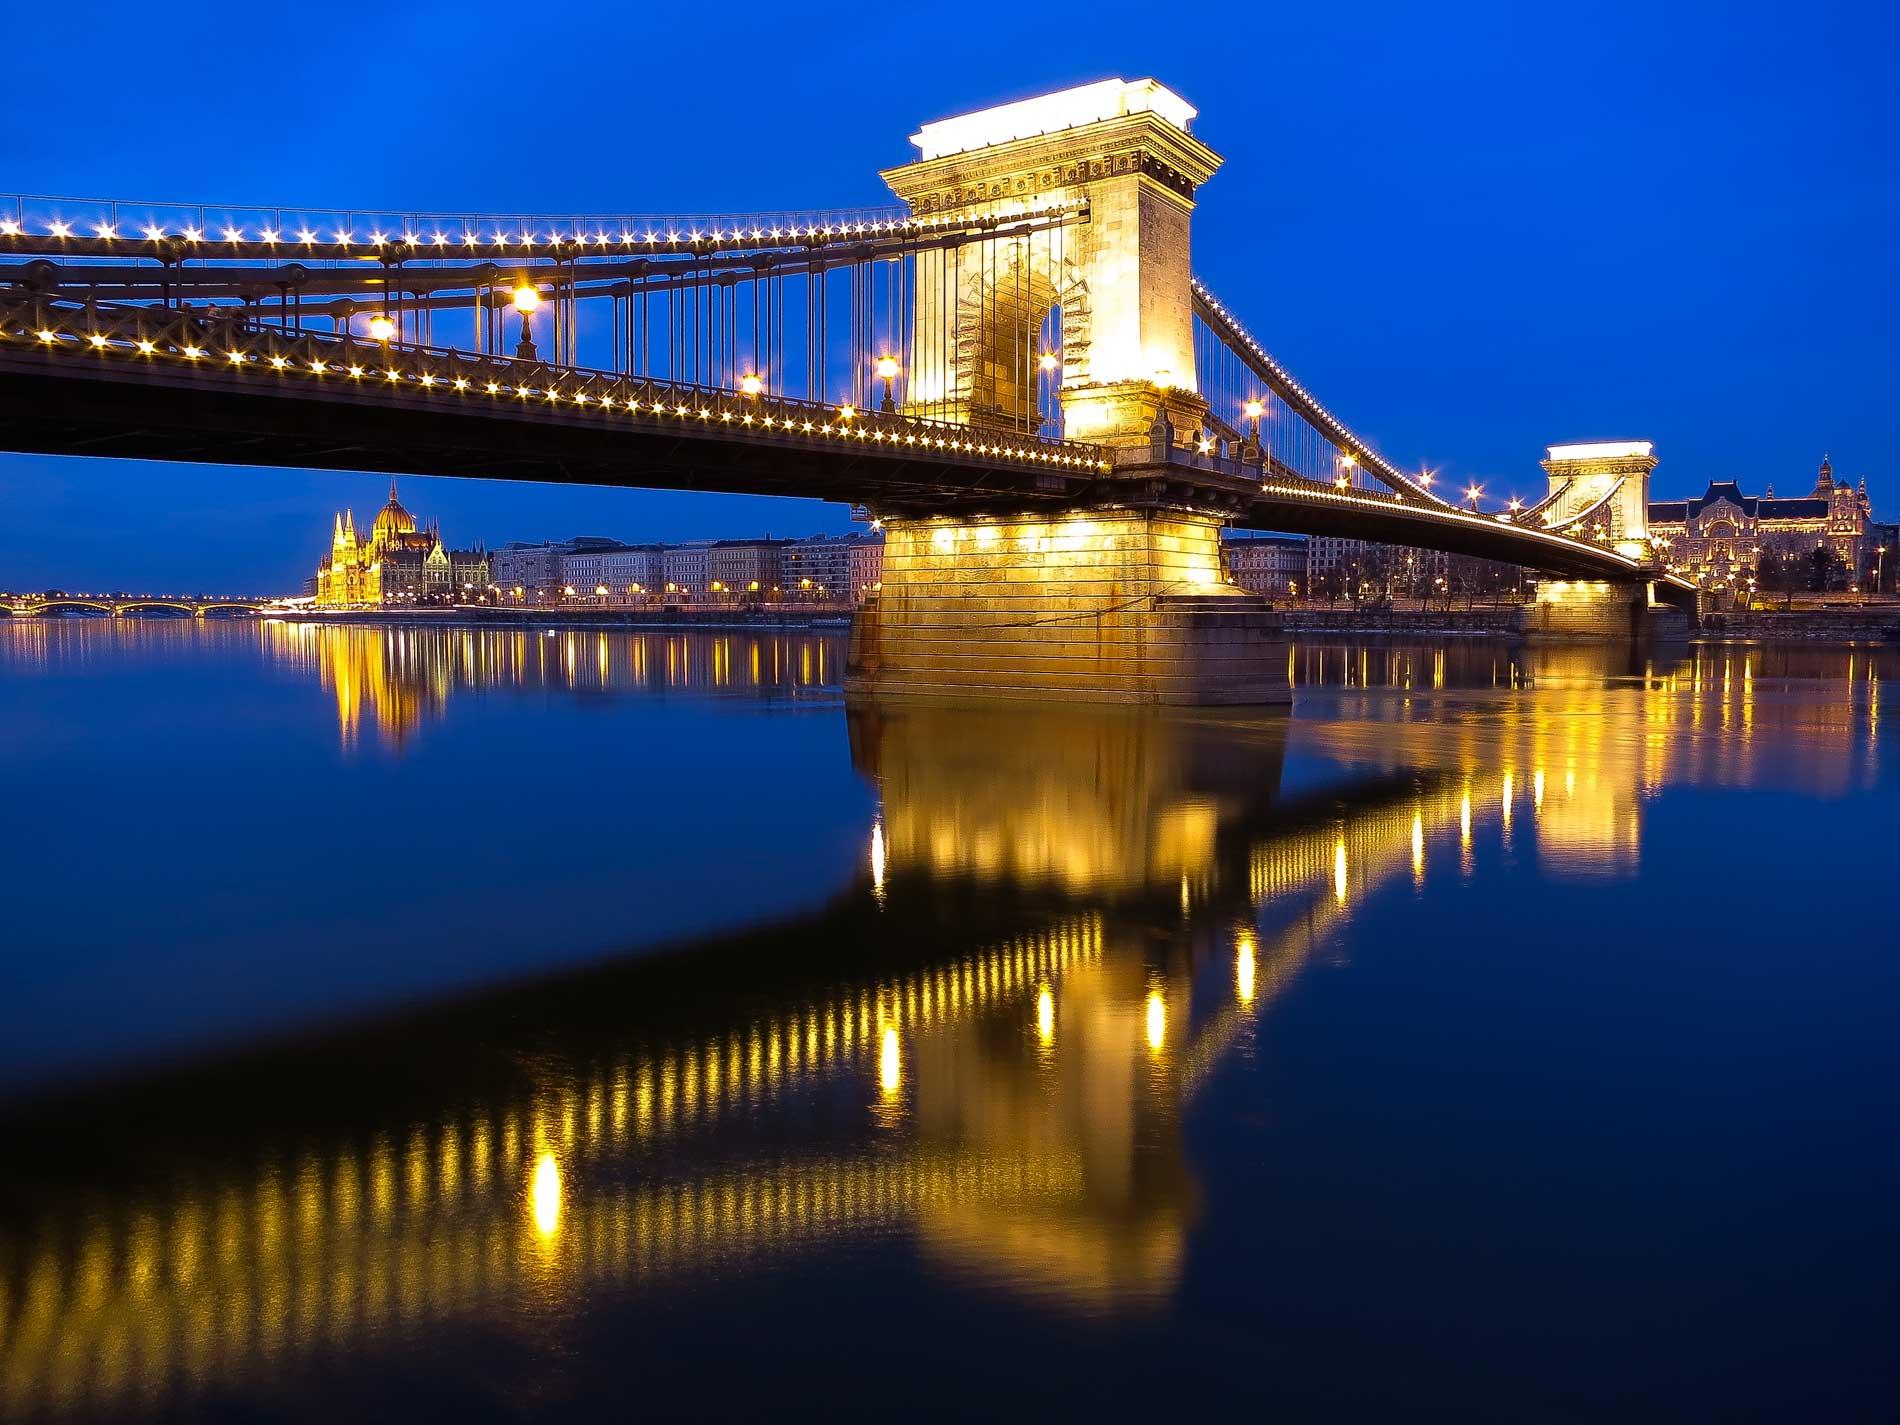 budapest_atthary_photography_bridge_40